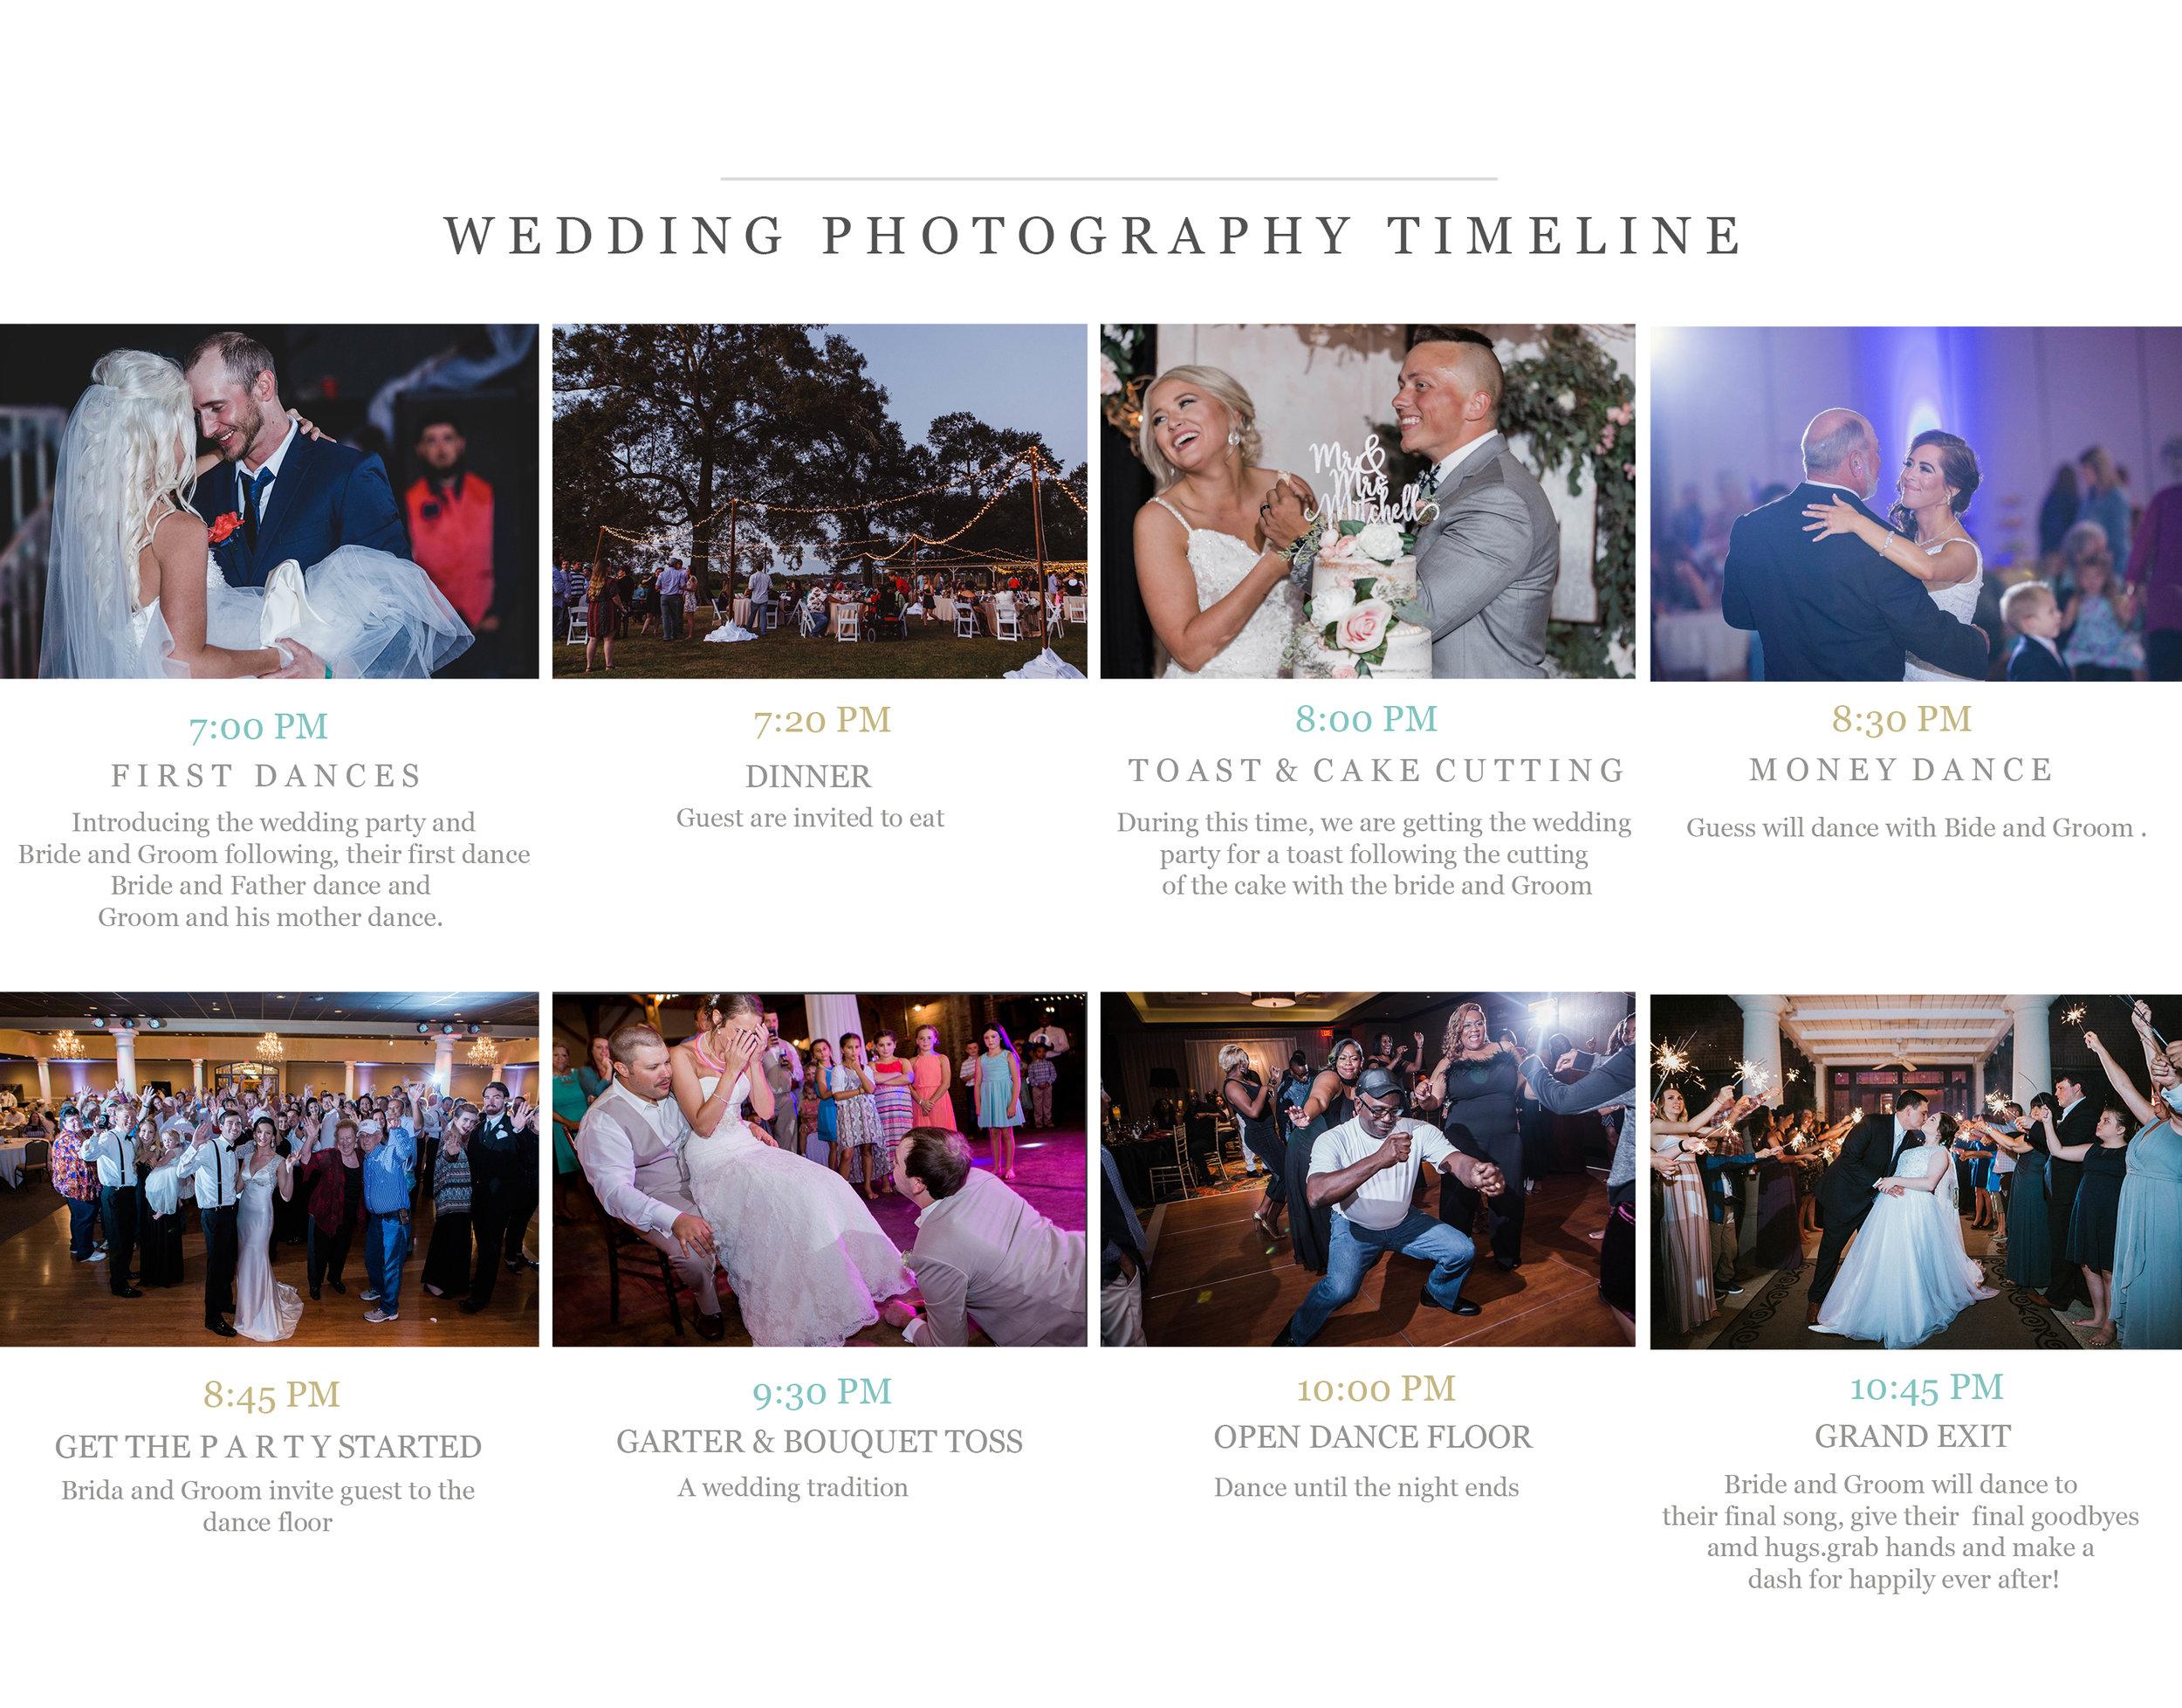 WeddingPhotographyTimeline 2-8x11.jpg